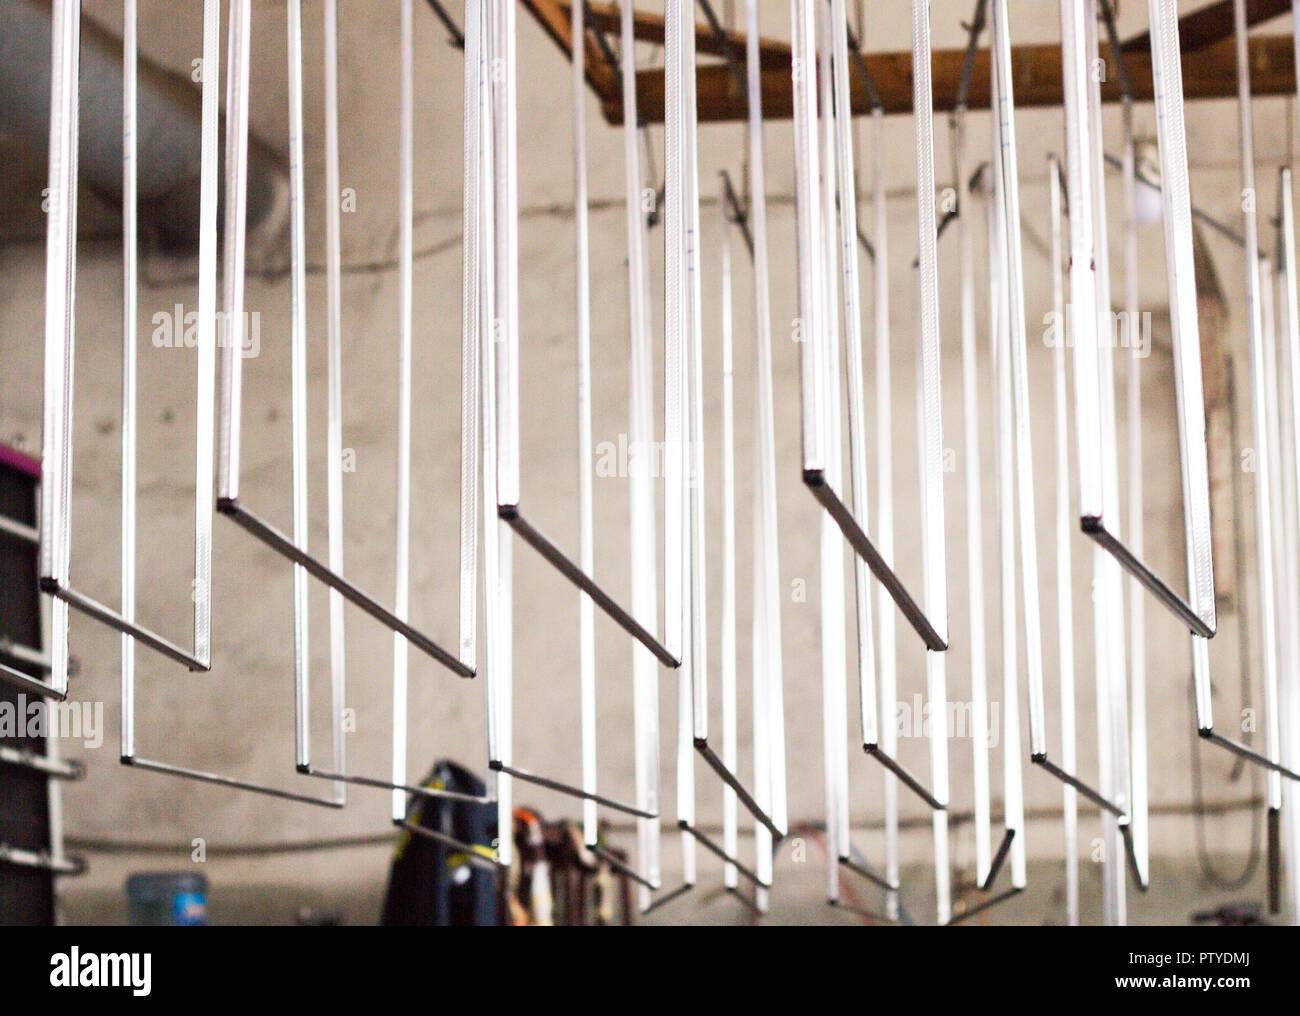 Metal Window Frames Stock Photos & Metal Window Frames Stock Images ...